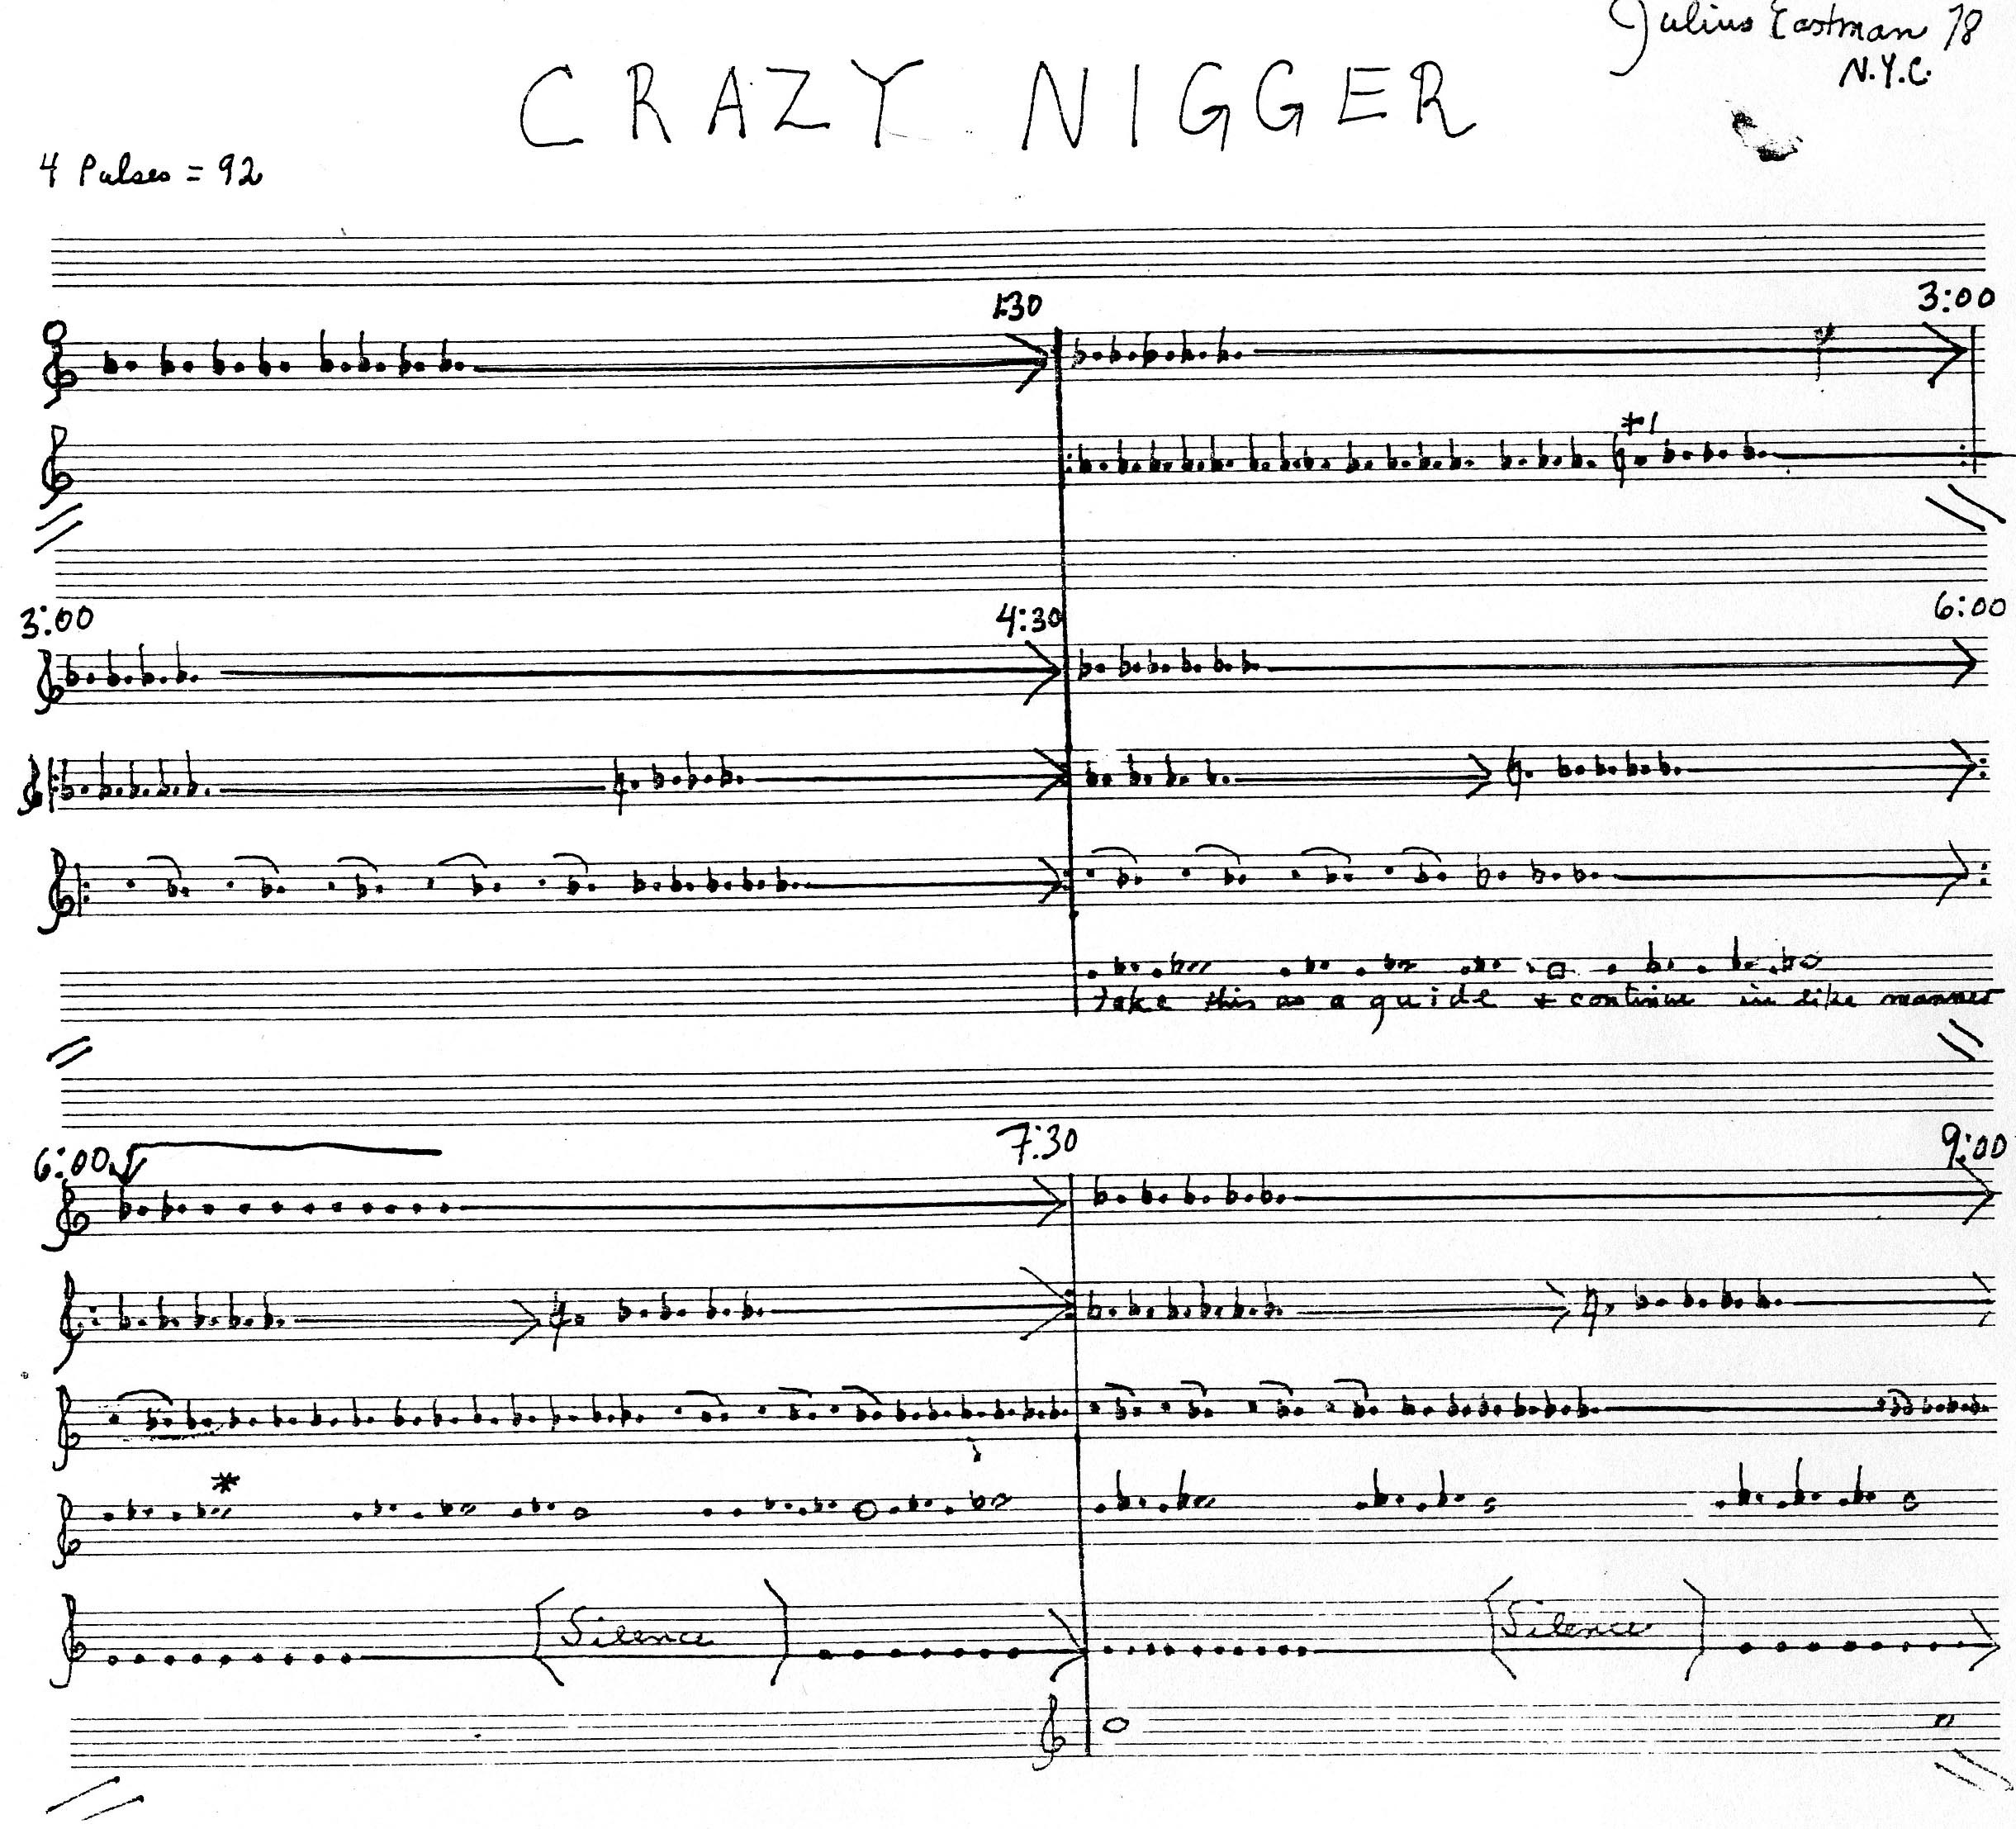 Eastman_Crazy Nigger Score Pg 1.jpg